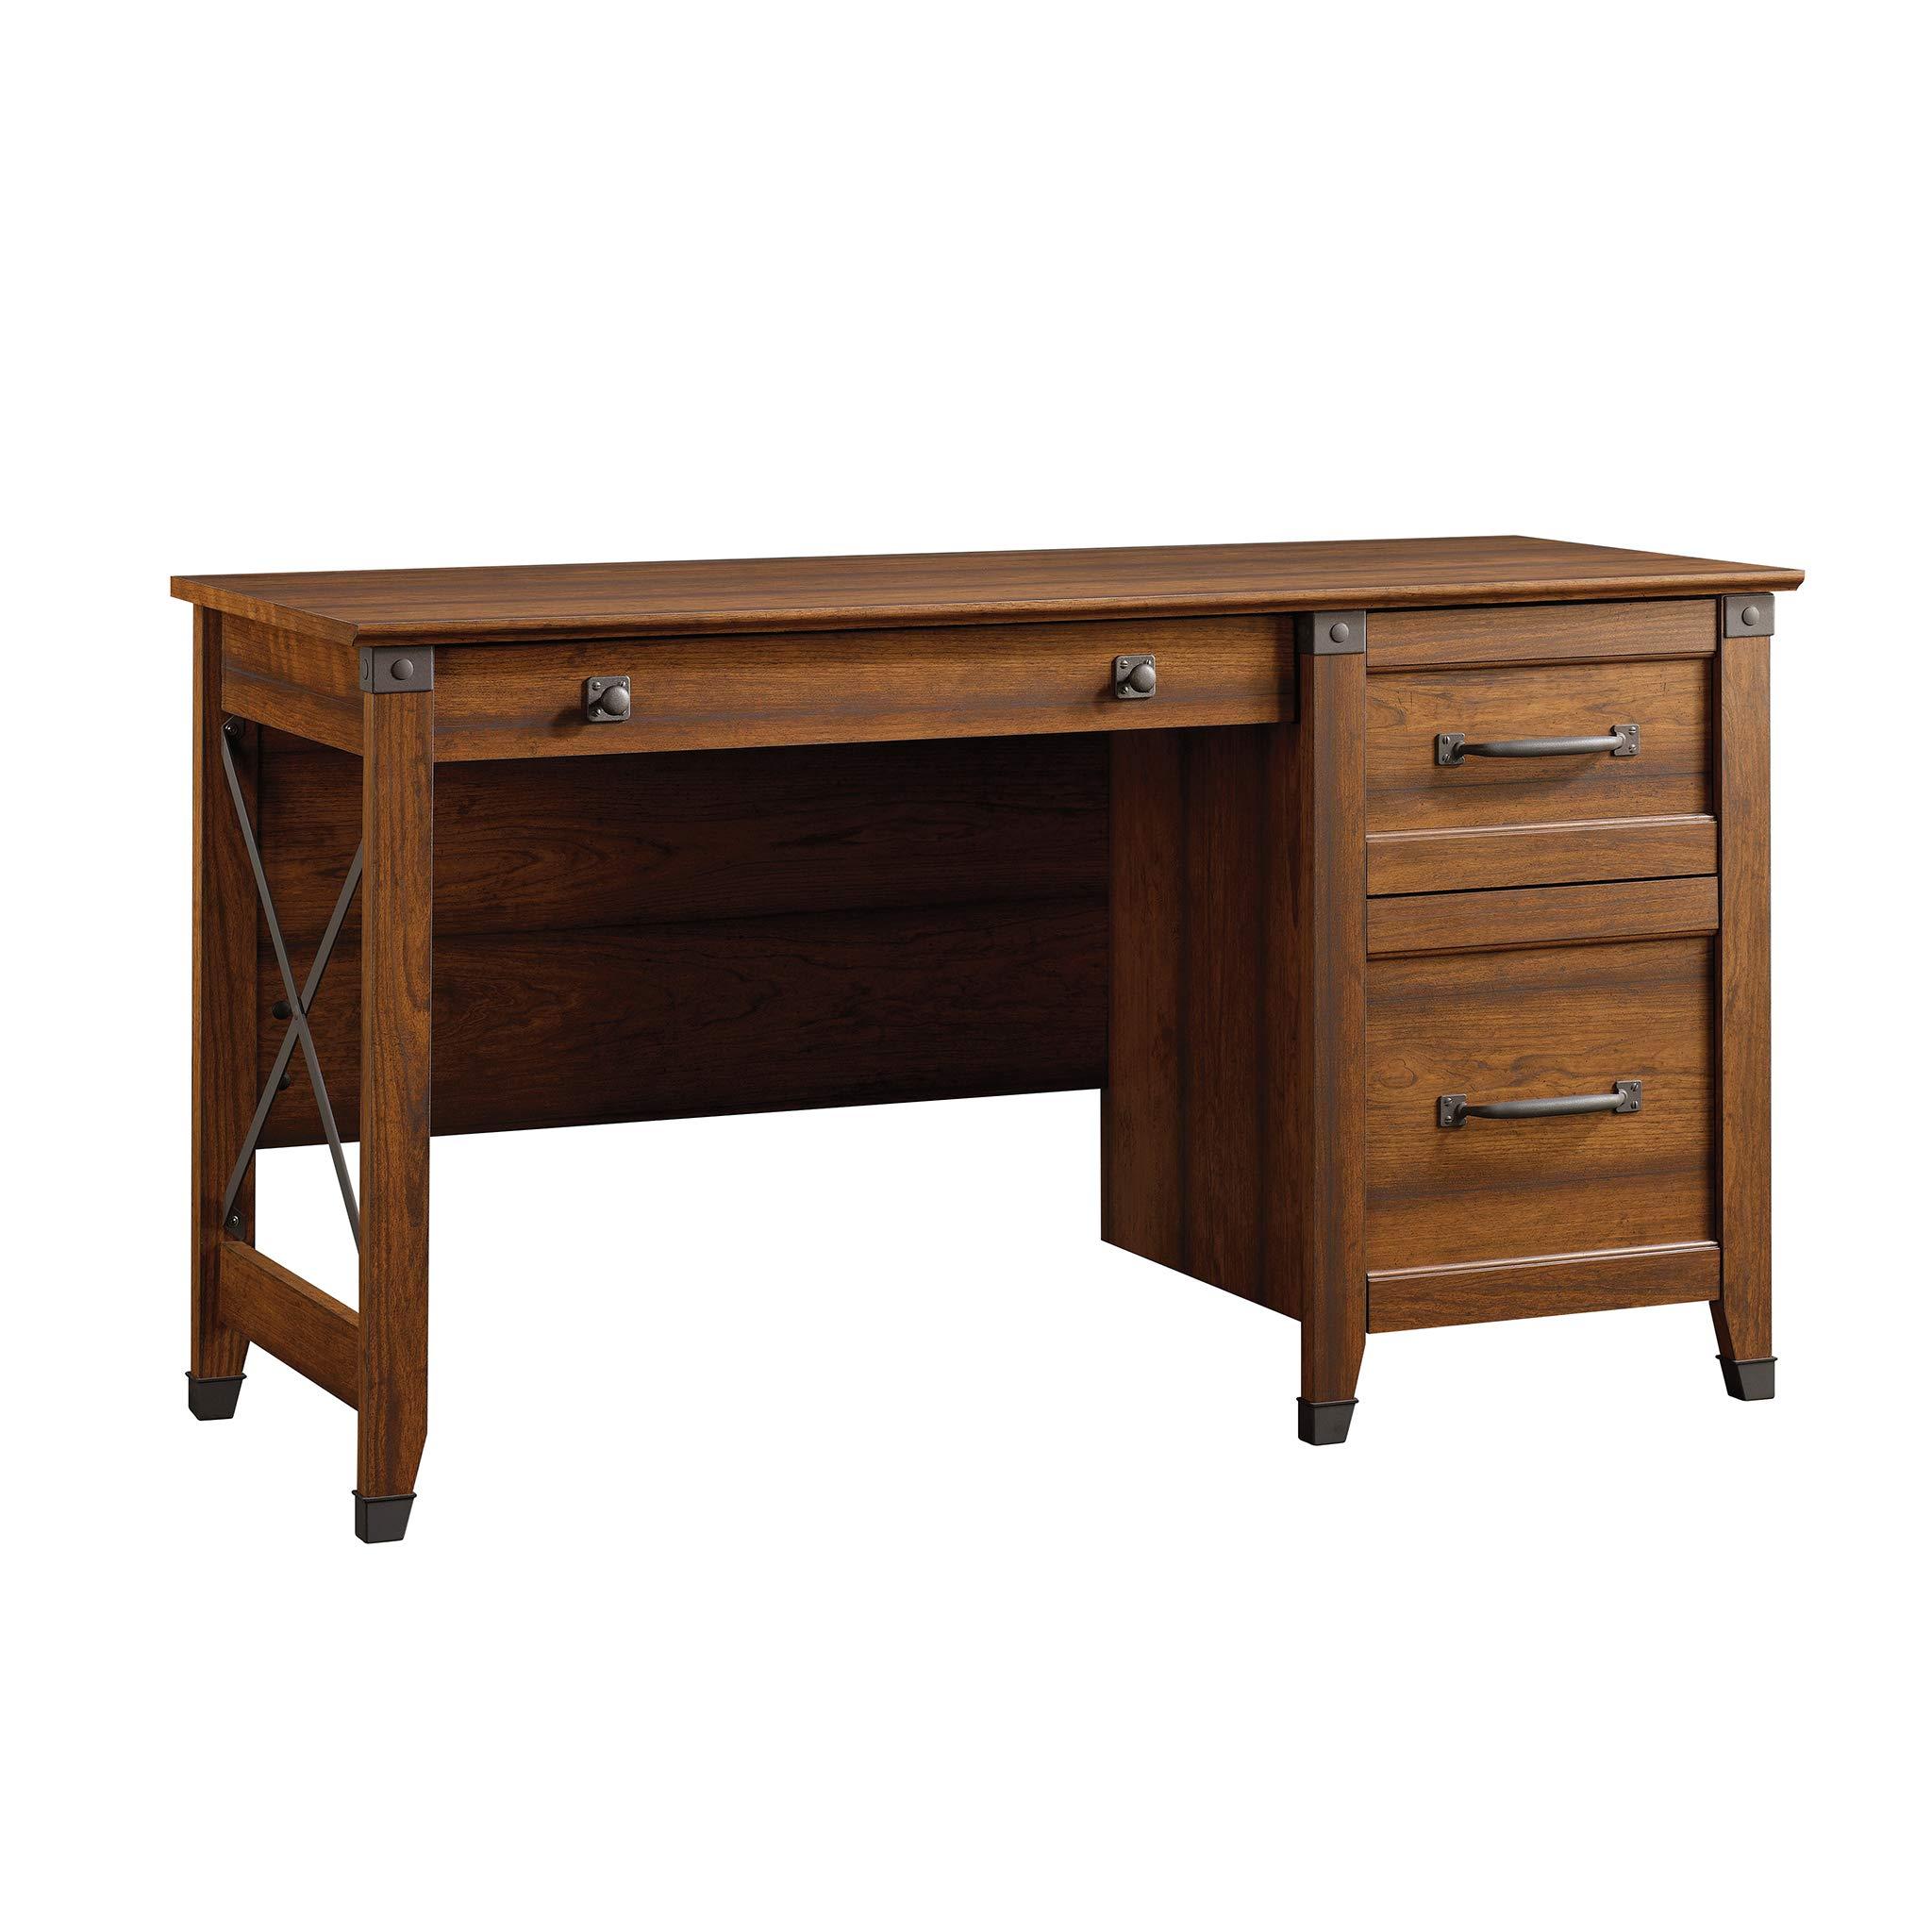 Sauder 412920 Carson Forge Desk, L: 53.19'' x W: 22.64'' x H: 29.8, Washington Cherry by Sauder